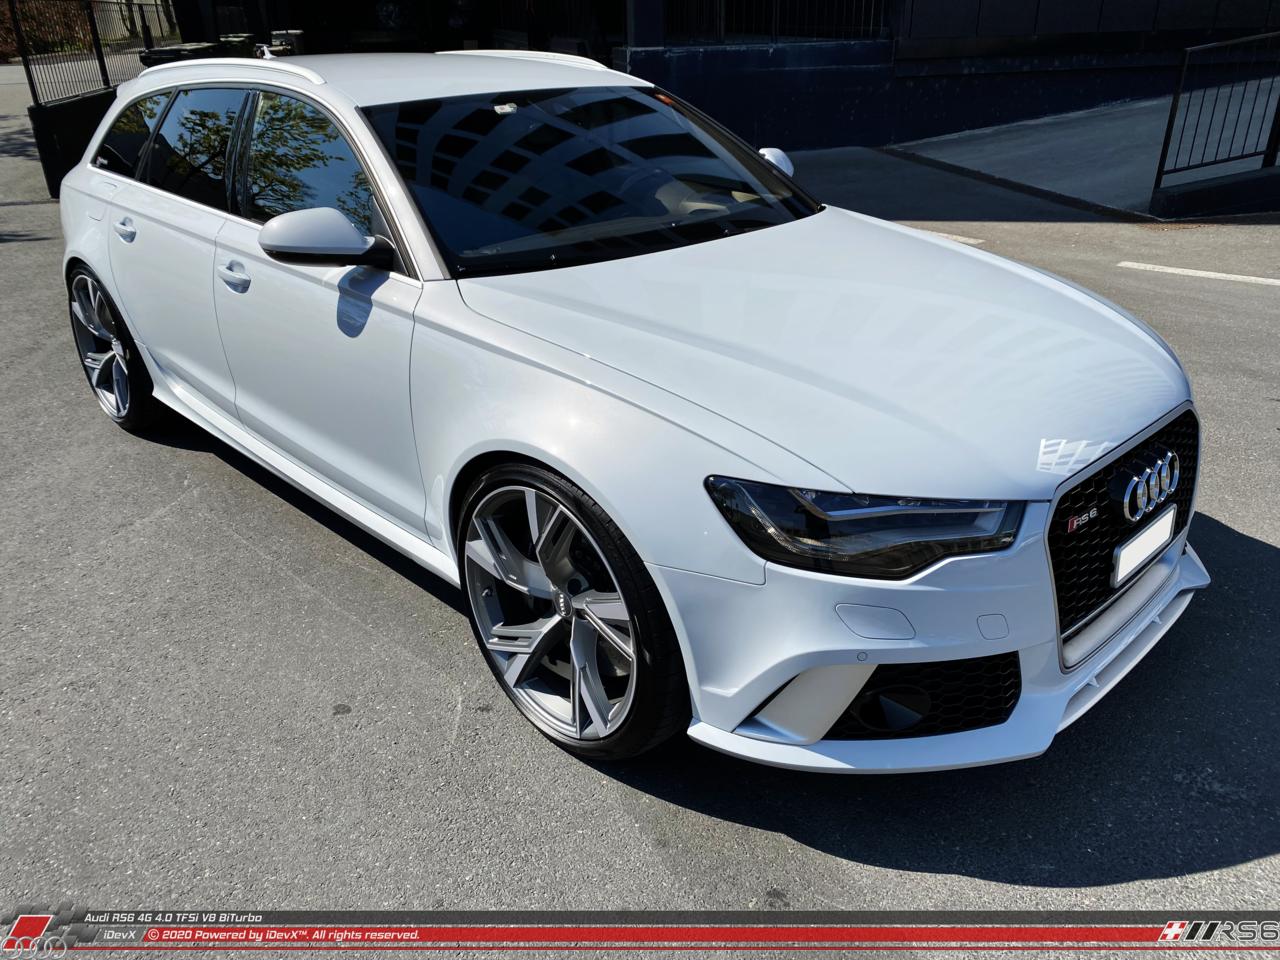 24.04.2020_Audi-RS6_iDevX_006.png